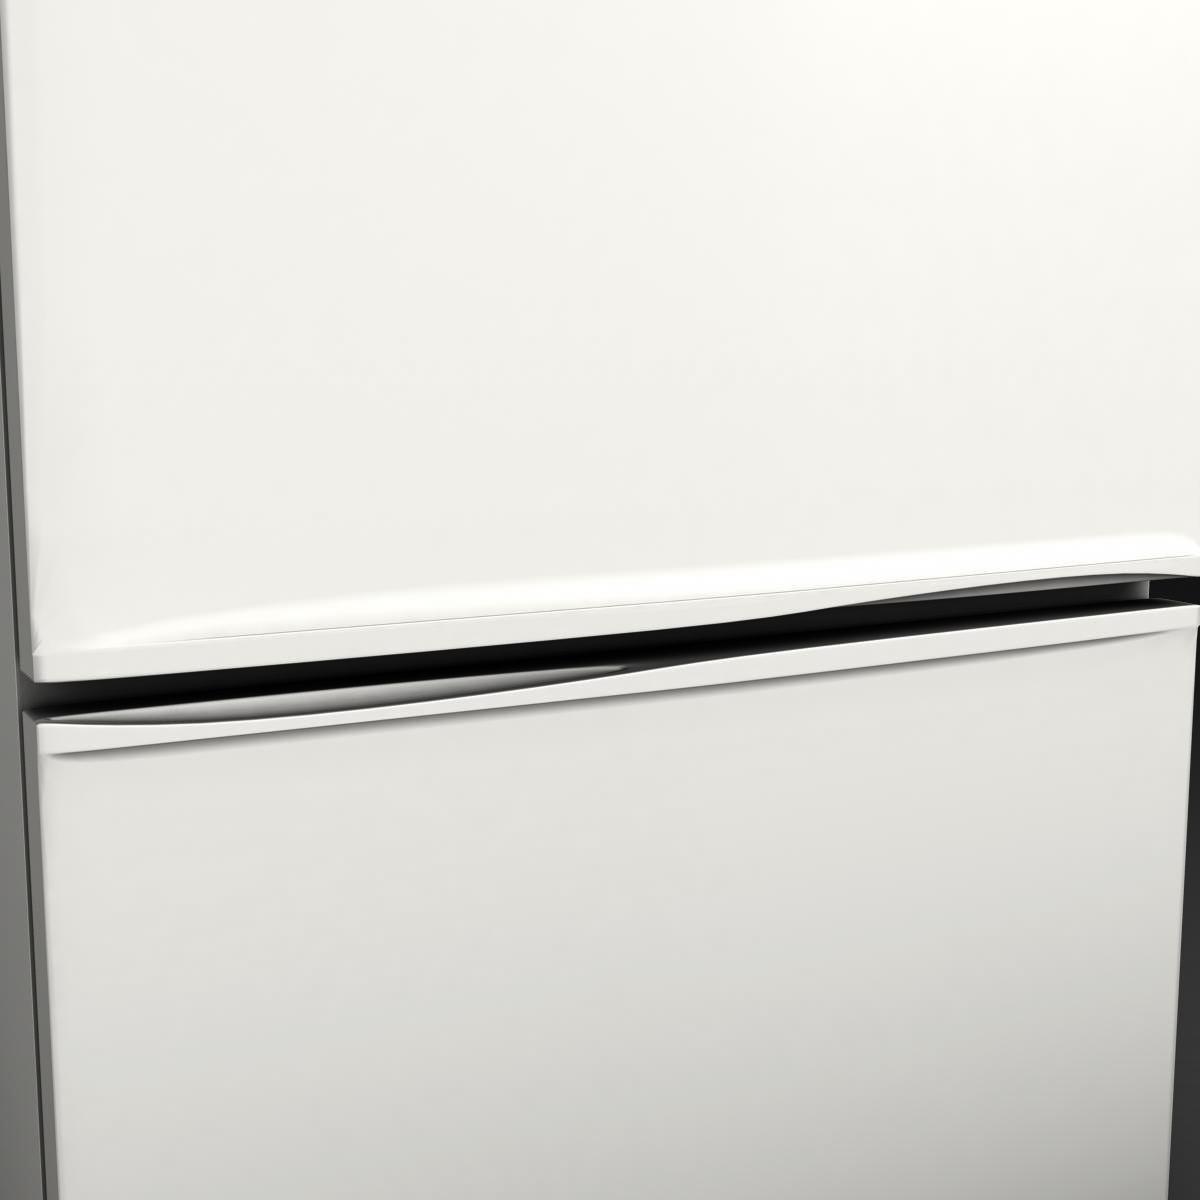 fridge 3d model 3ds max fbx ma mb obj 158908